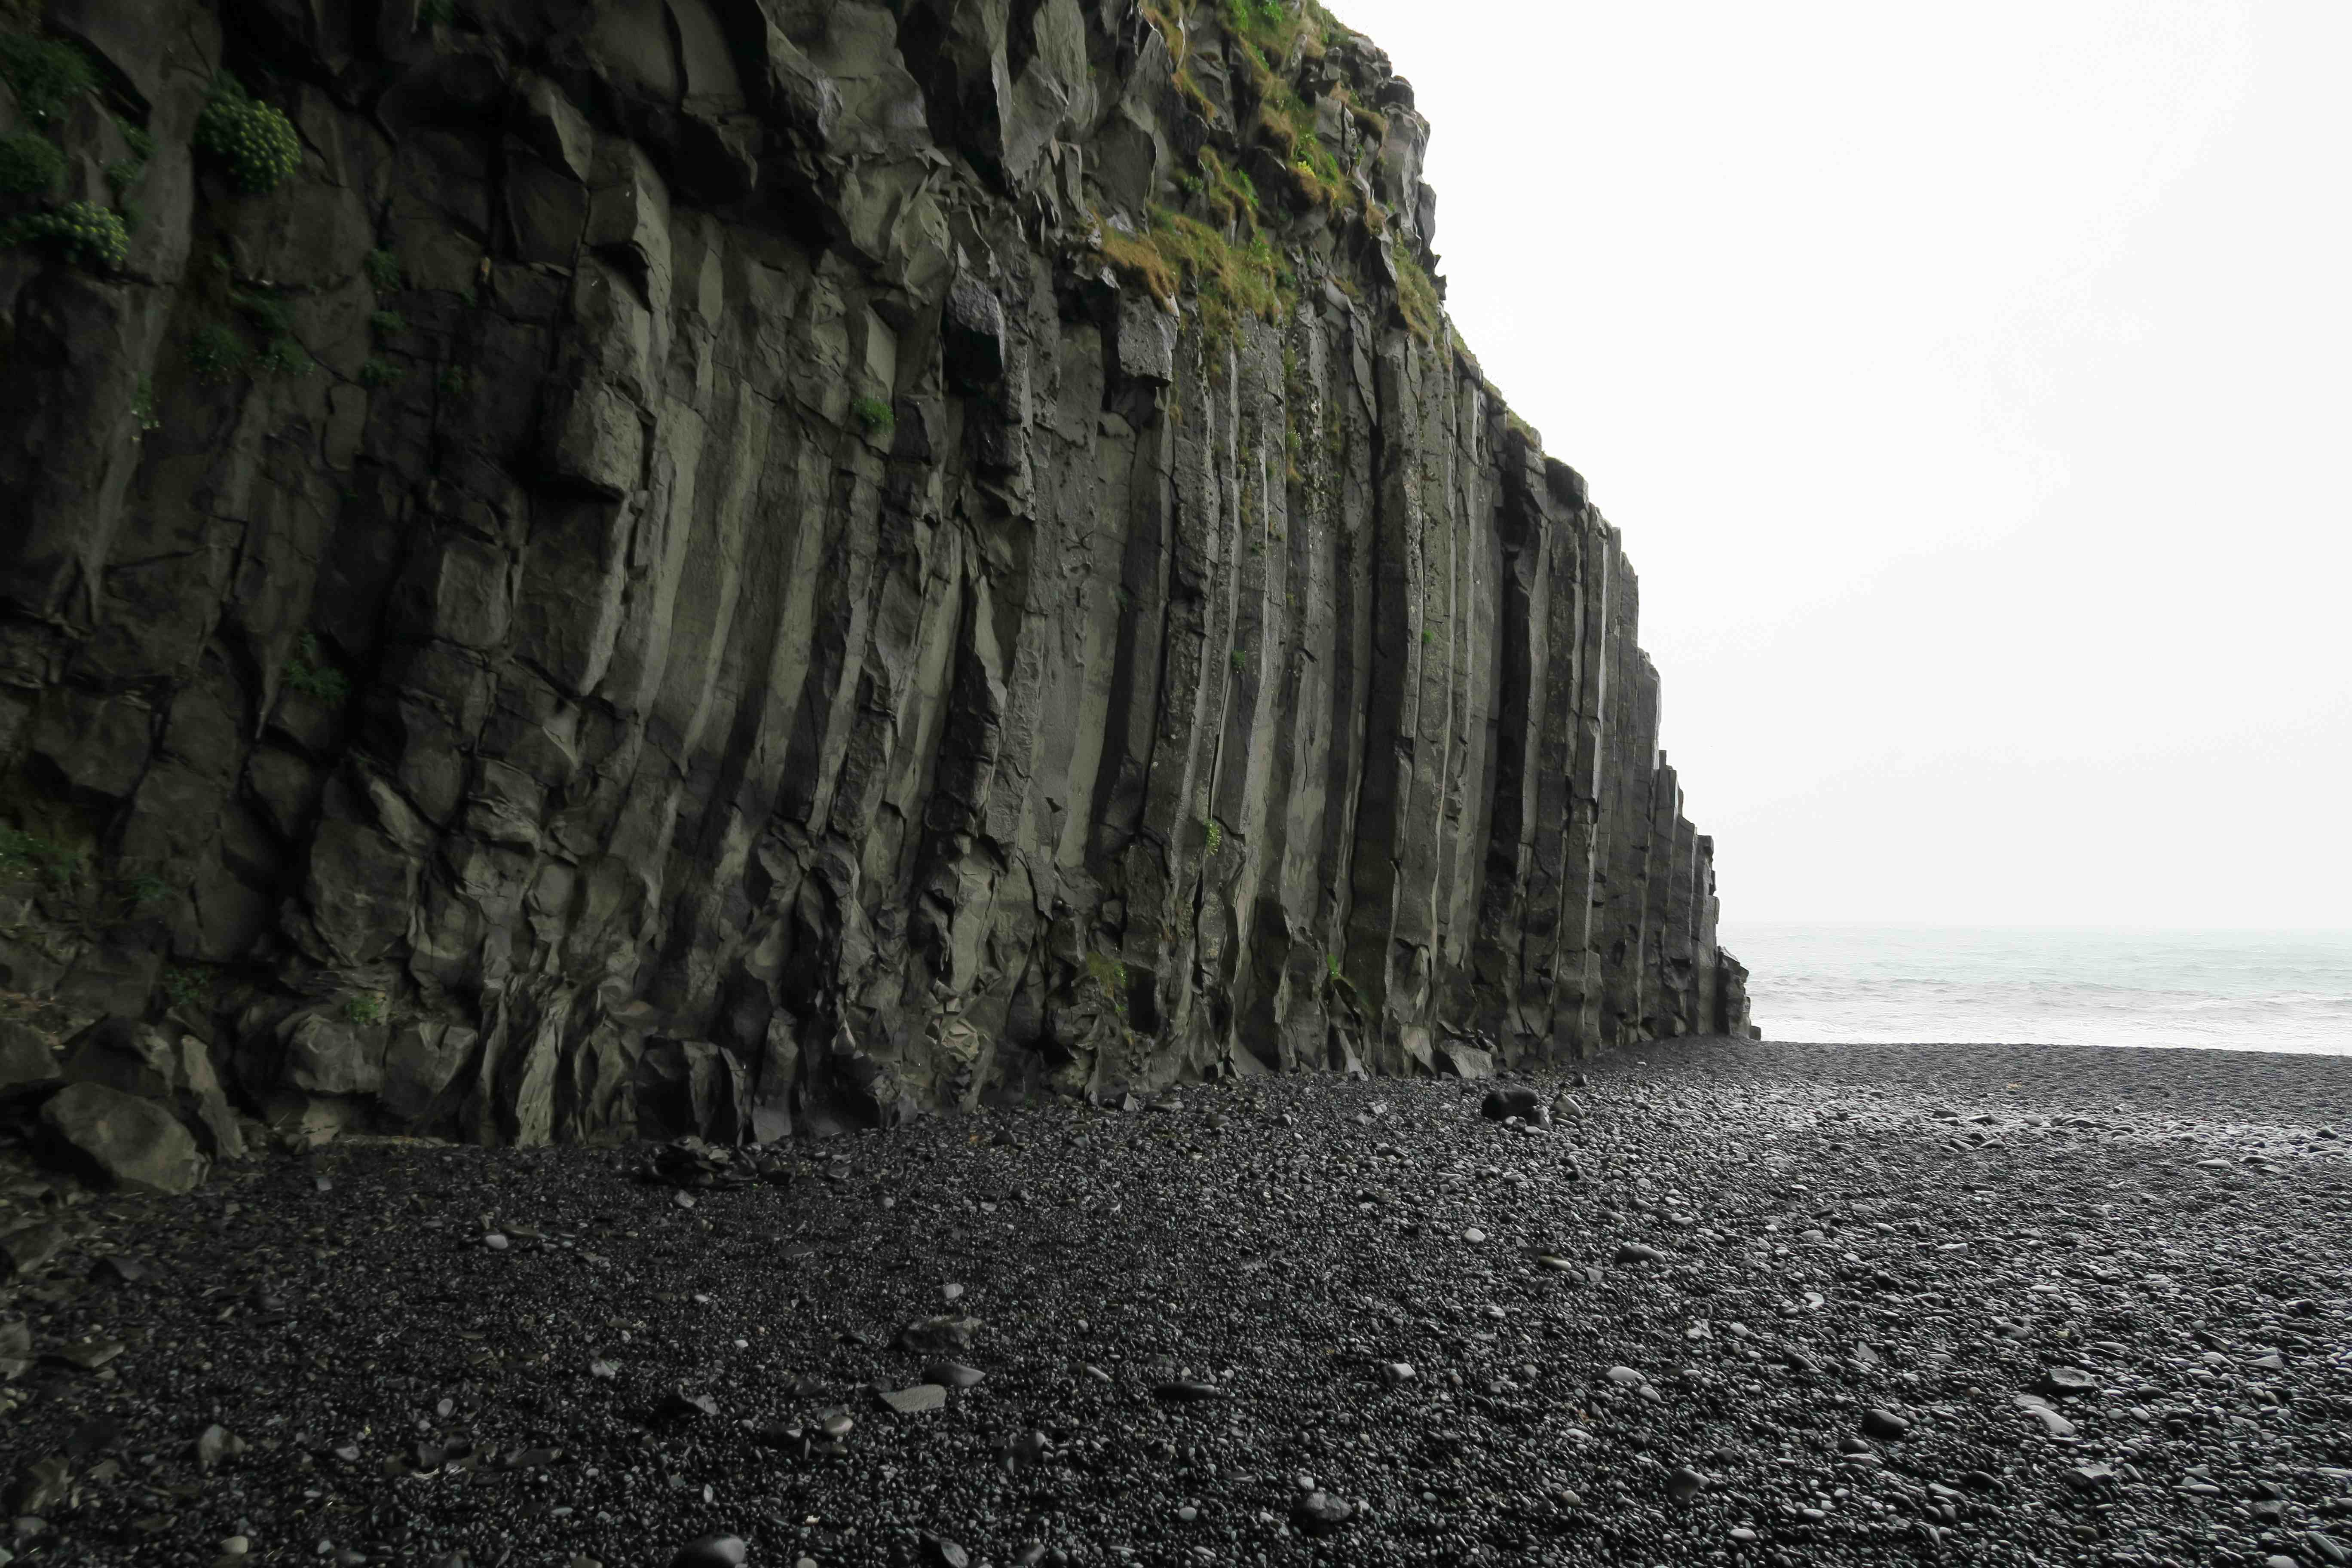 02 Reynisfjara 1024x683 - 7 Gems You Must See in South Iceland